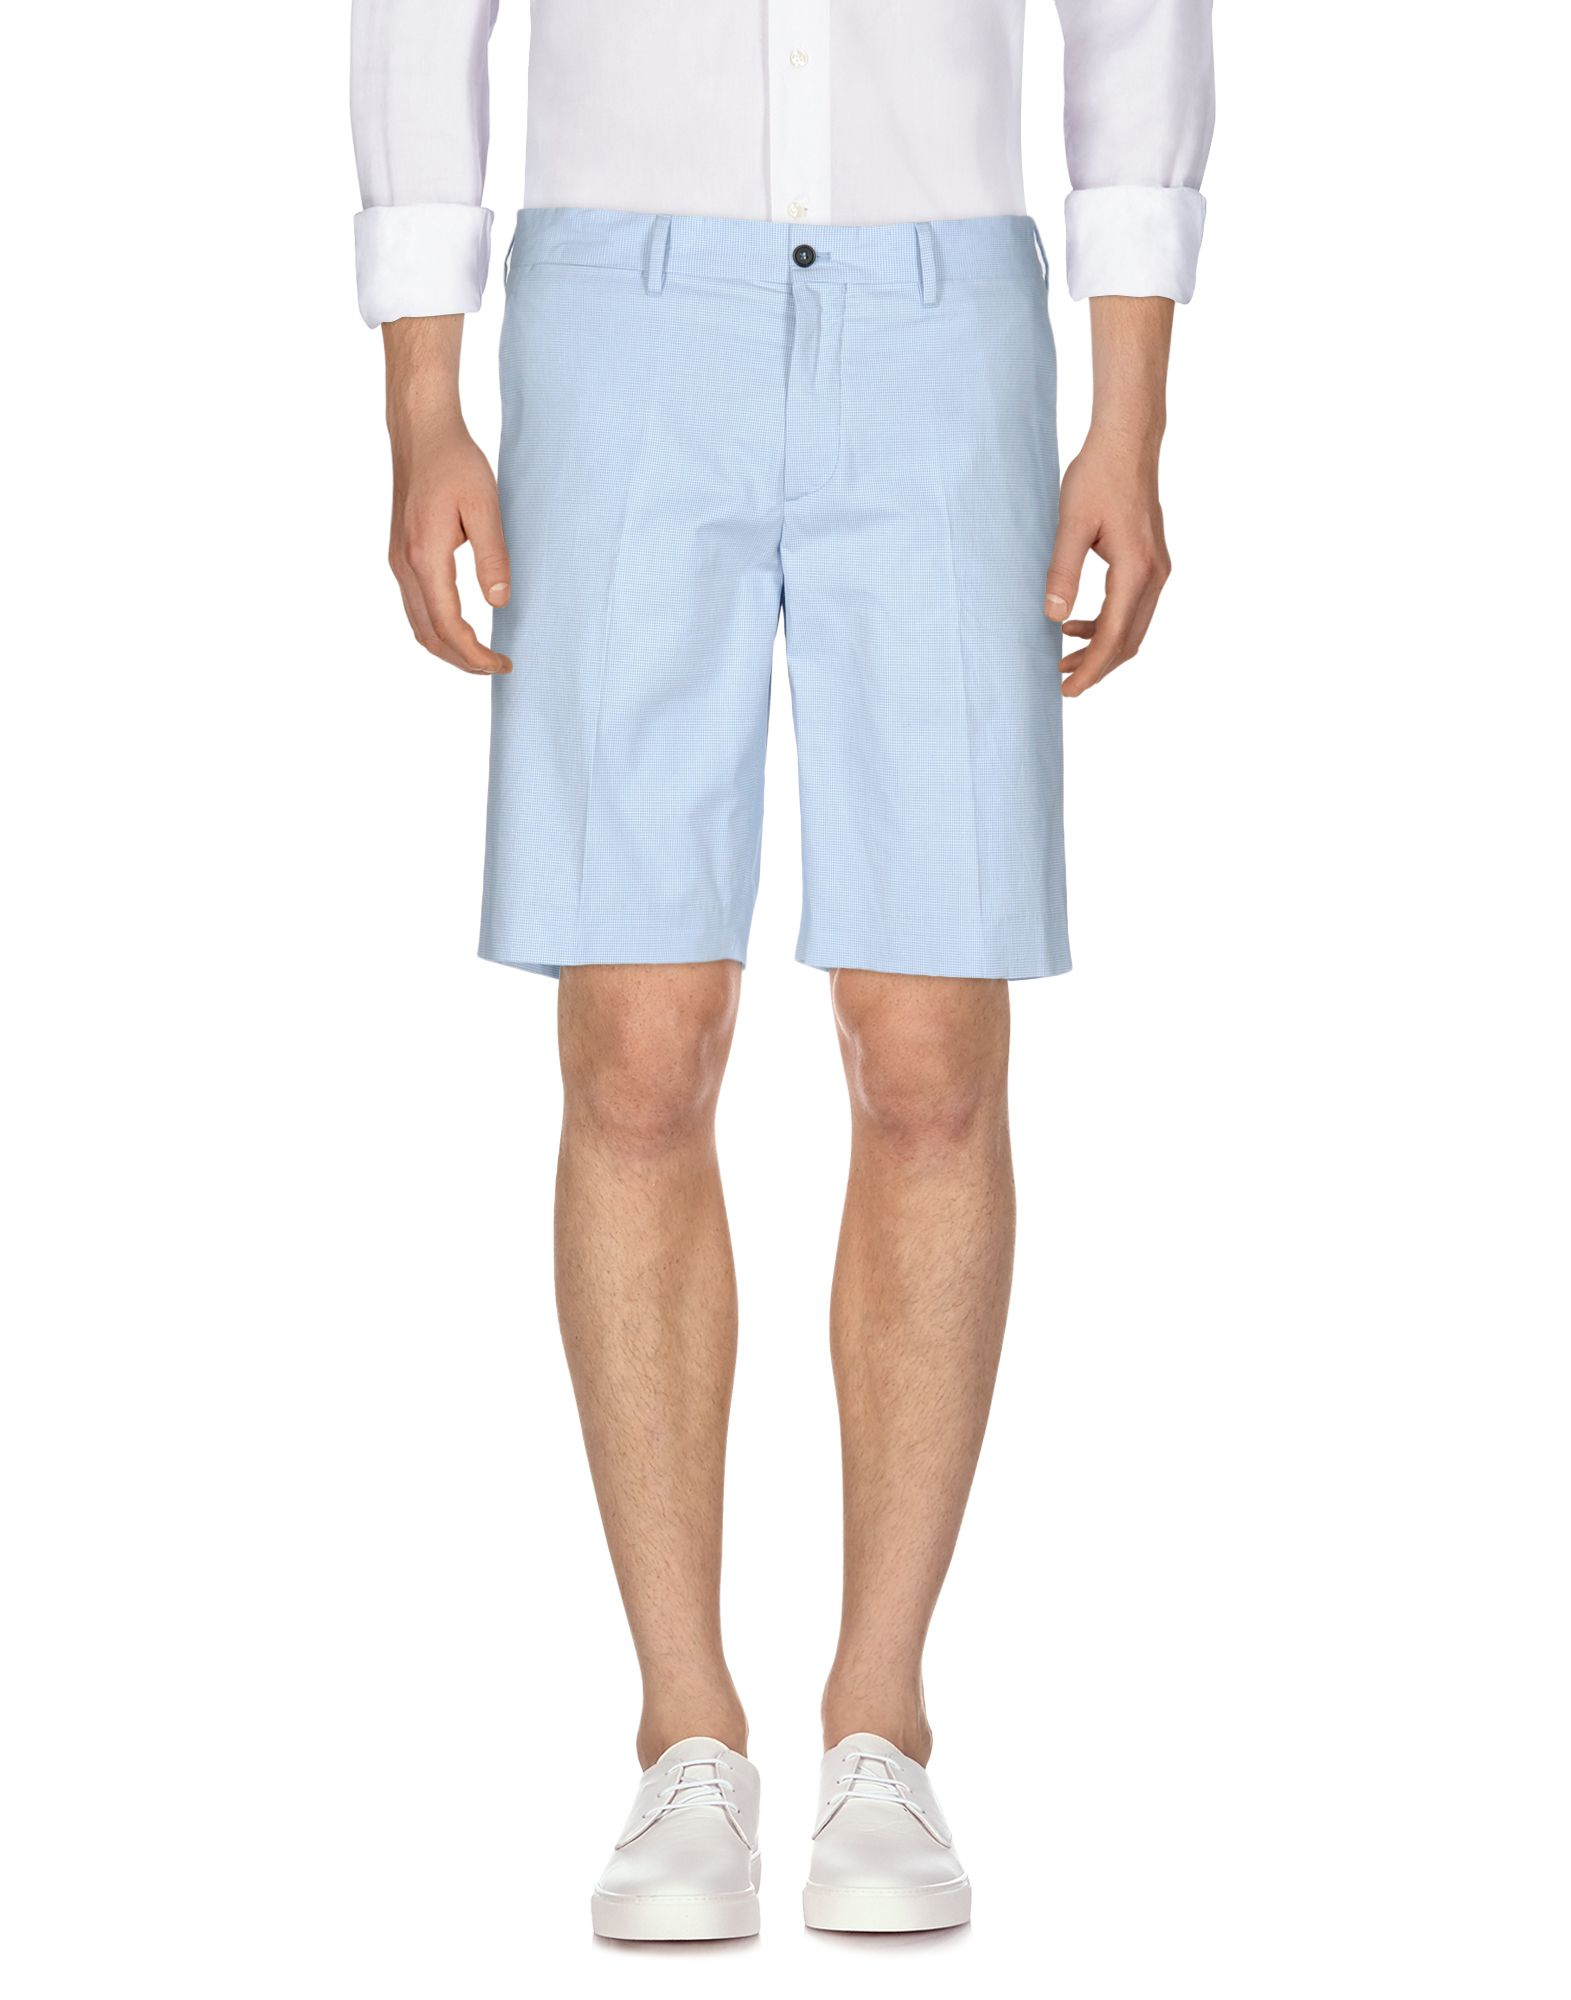 Pantalone Classico Prada Uomo - Acquista online su